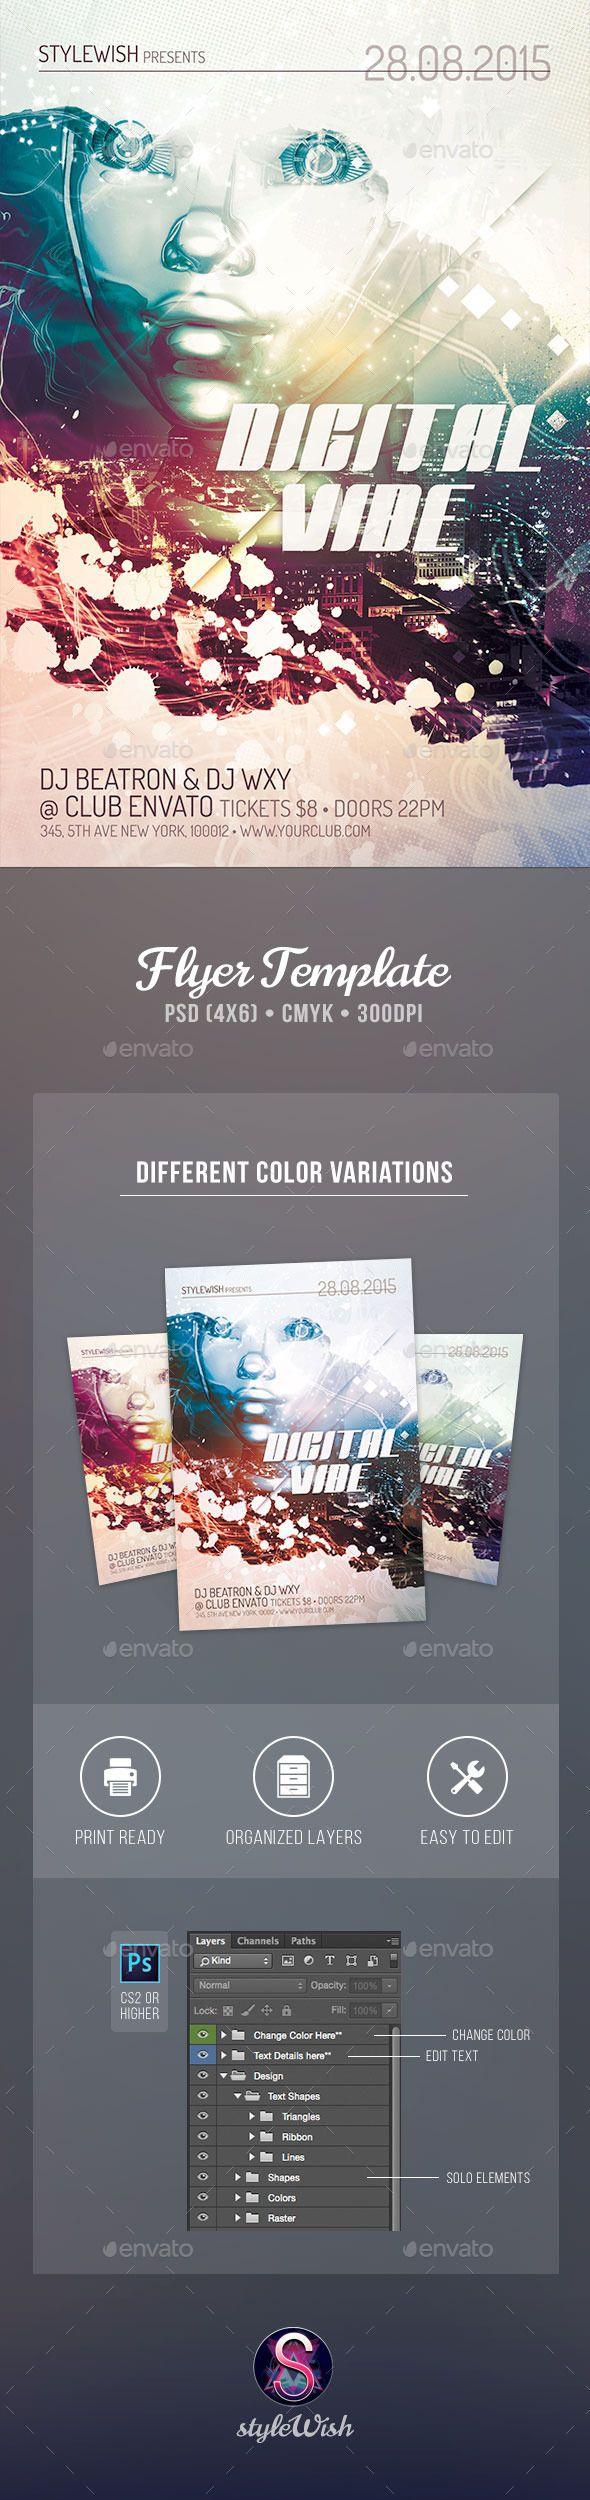 Digital Vibe Flyer Template #prospectus #flugblatt  Download: http://graphicriver.net/item/digital-vibe-flyer/12137762?ref=ksioks